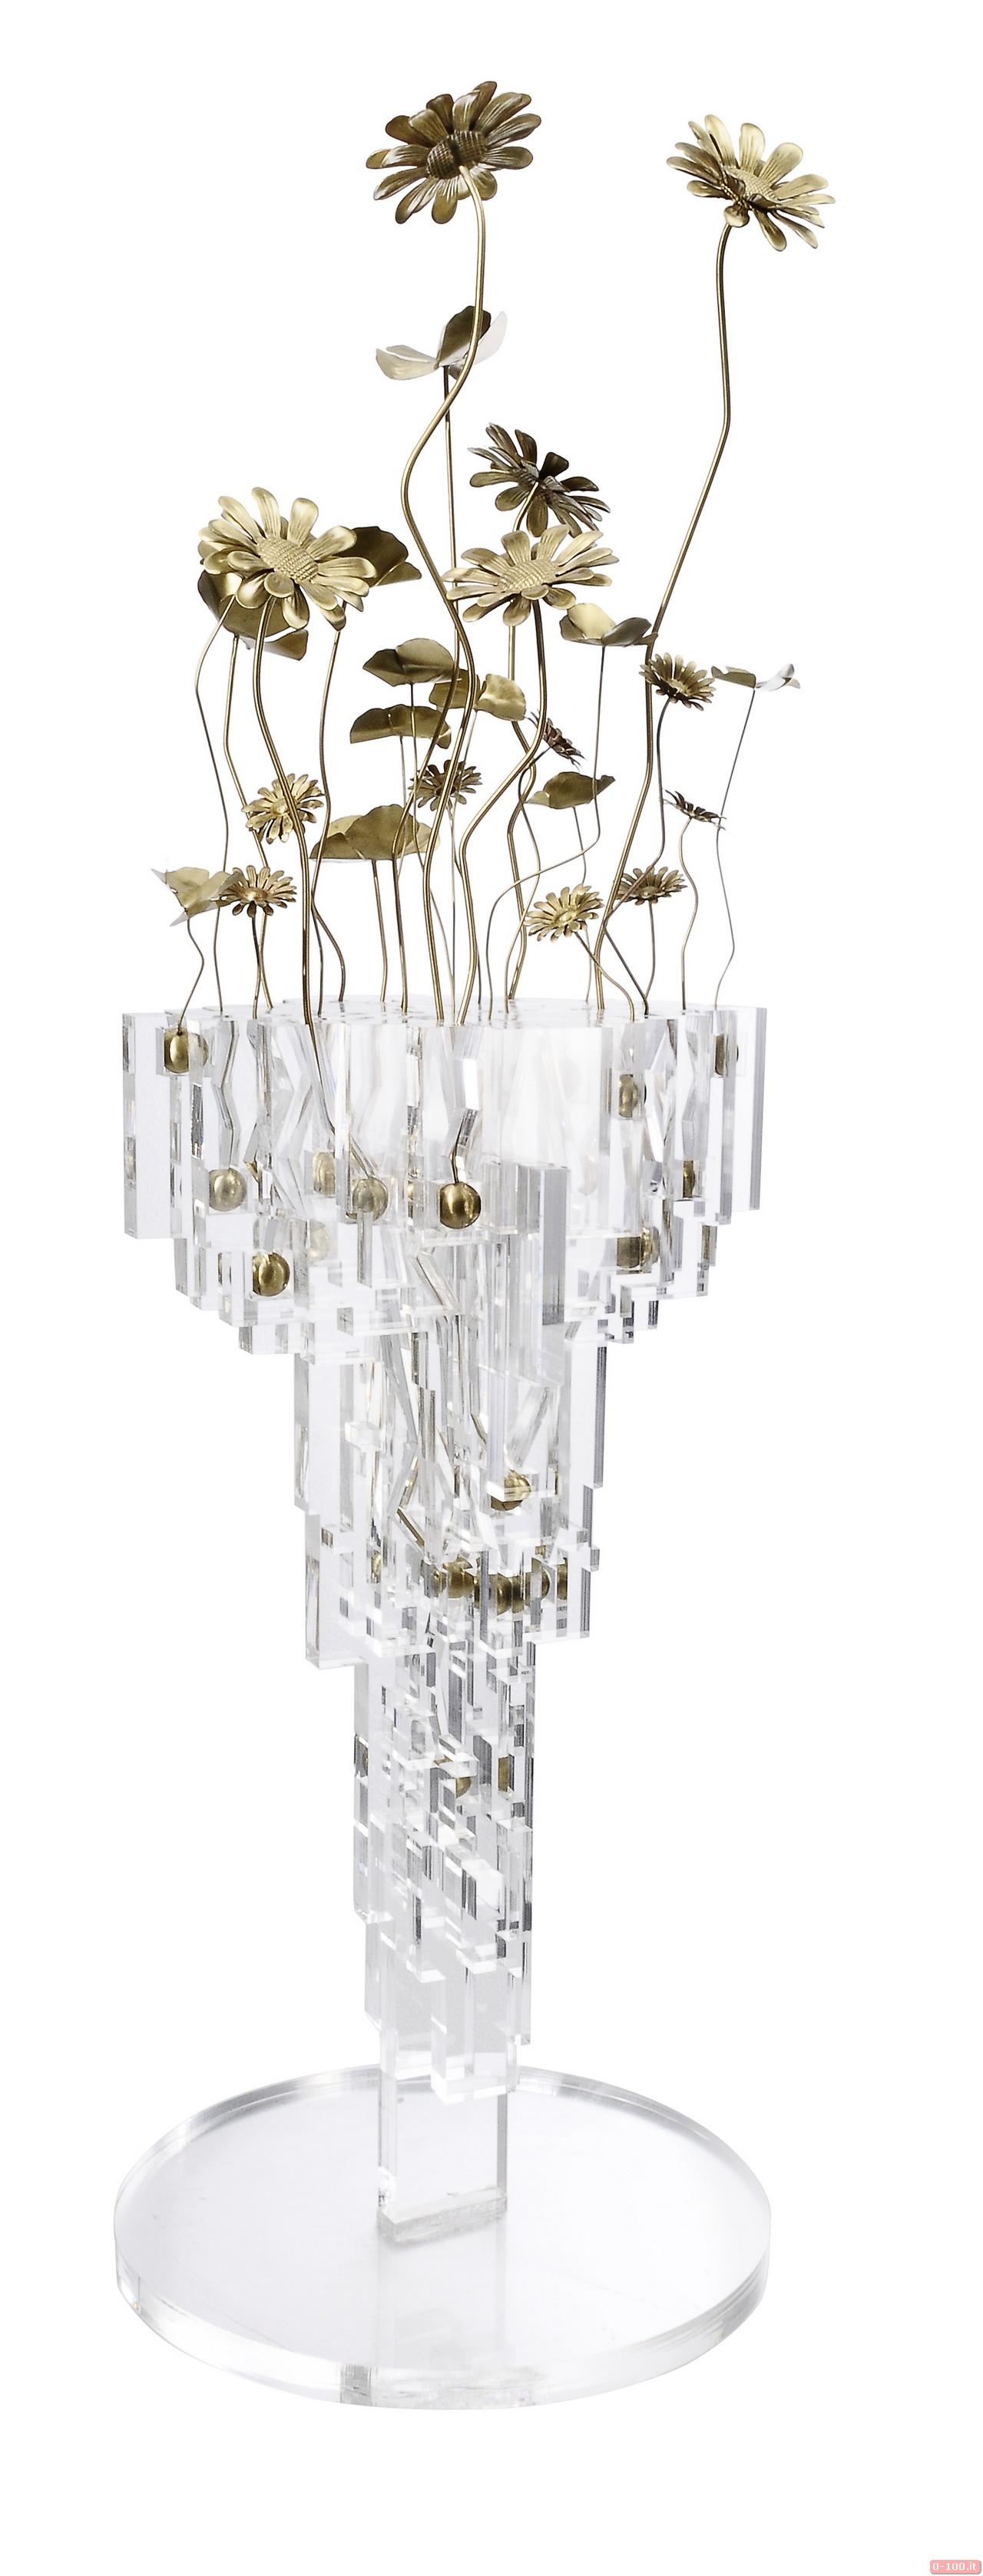 Blooming Creativity_La Renaissance de Coré - Nikola Relota_Van Cleef & Arpels_0-100 1